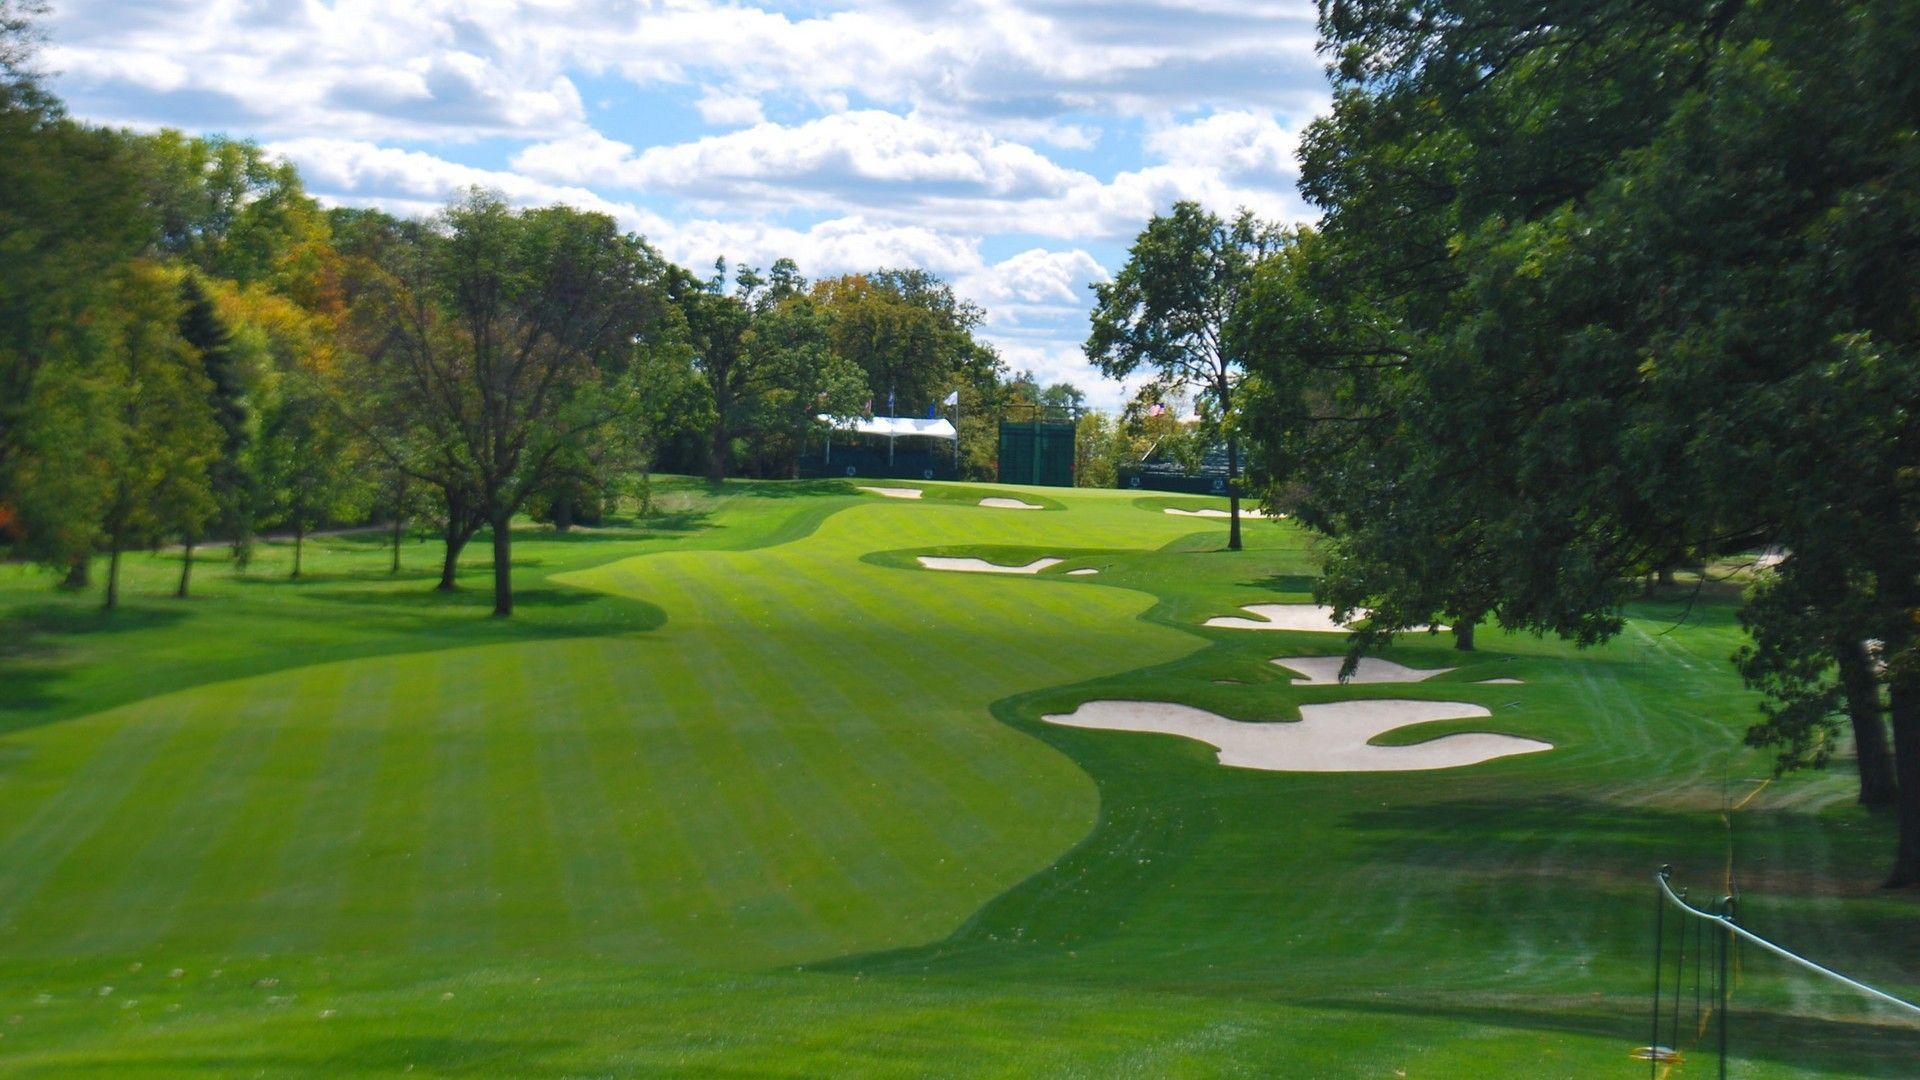 1920x1080 Hd Golf Wallpapers Top Free 1920x1080 Hd Golf Backgrounds Wallpaperaccess